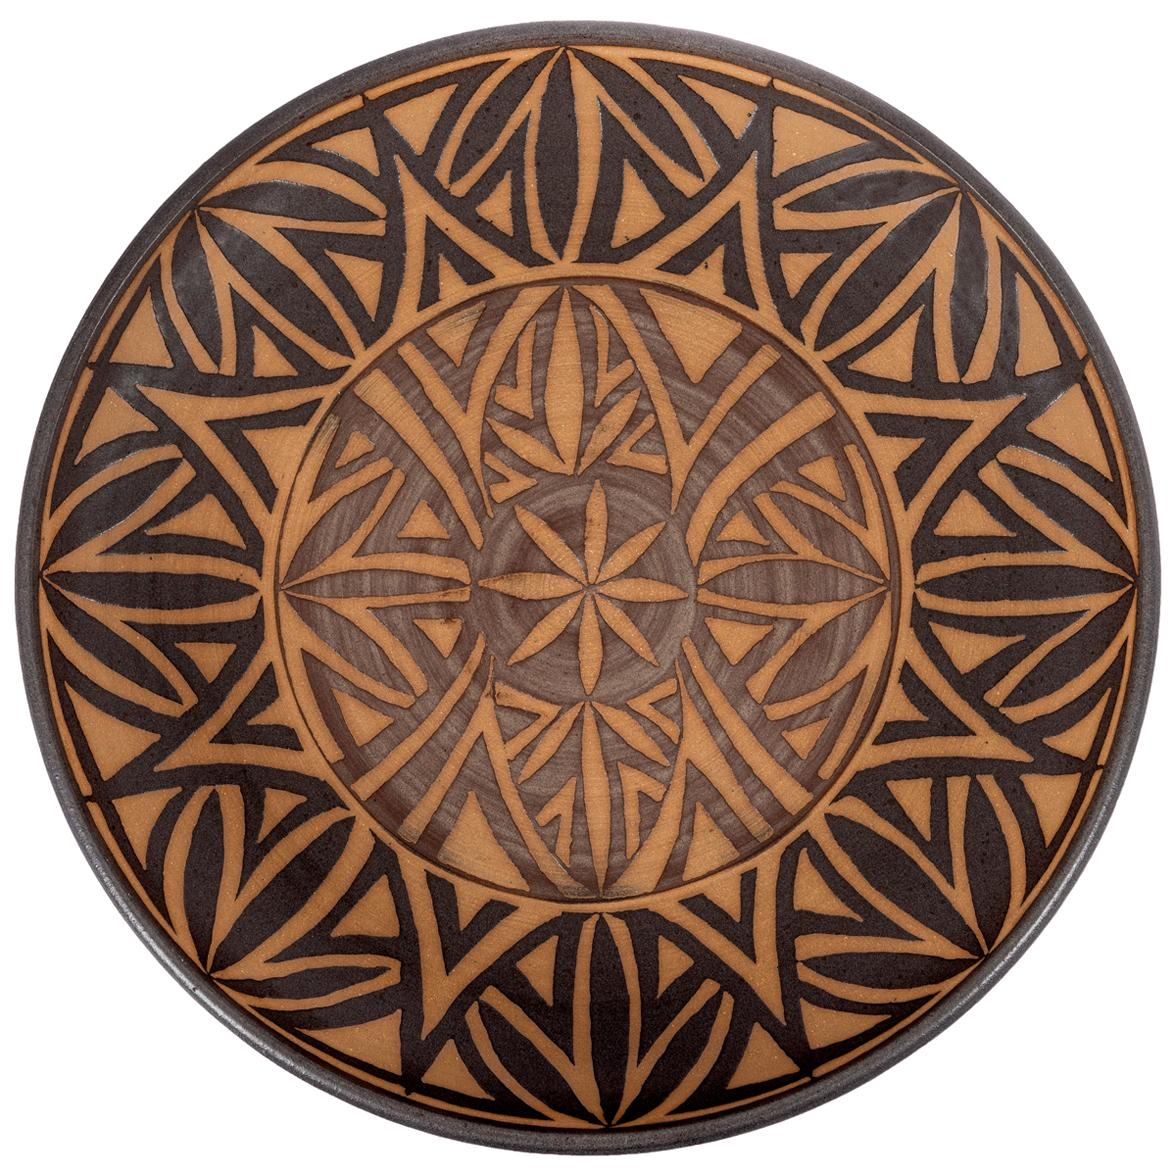 Clyde Burt Ceramic Platter